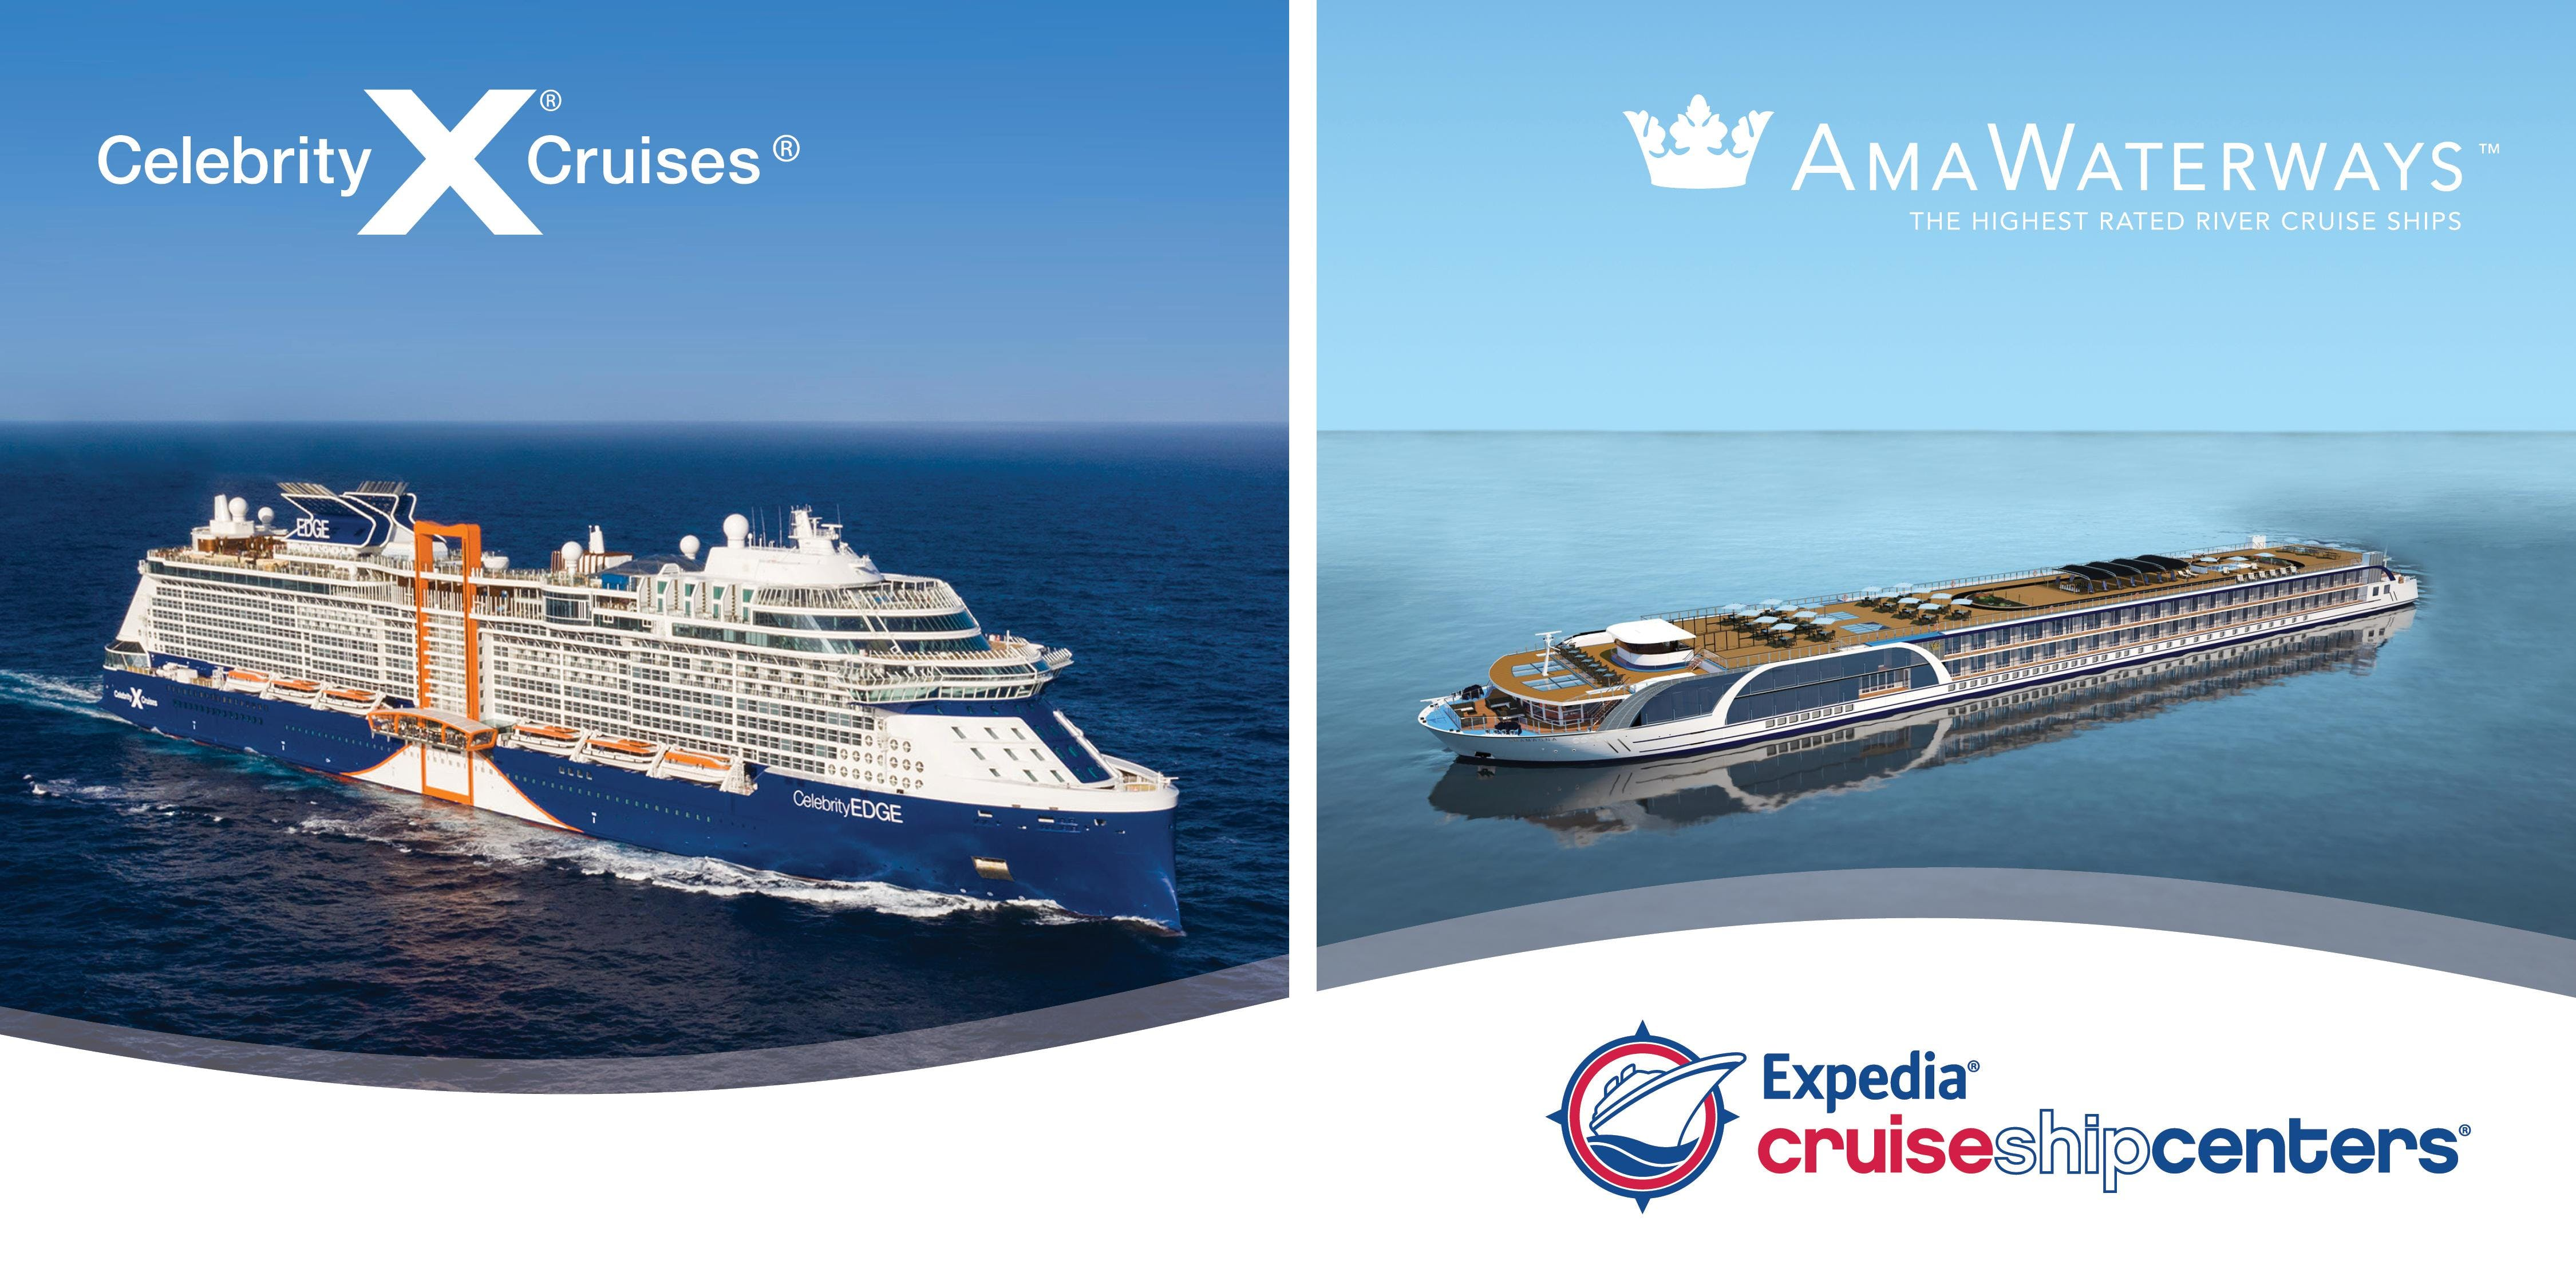 Cruise Night with AMAWaterways and Celebrity Cruises